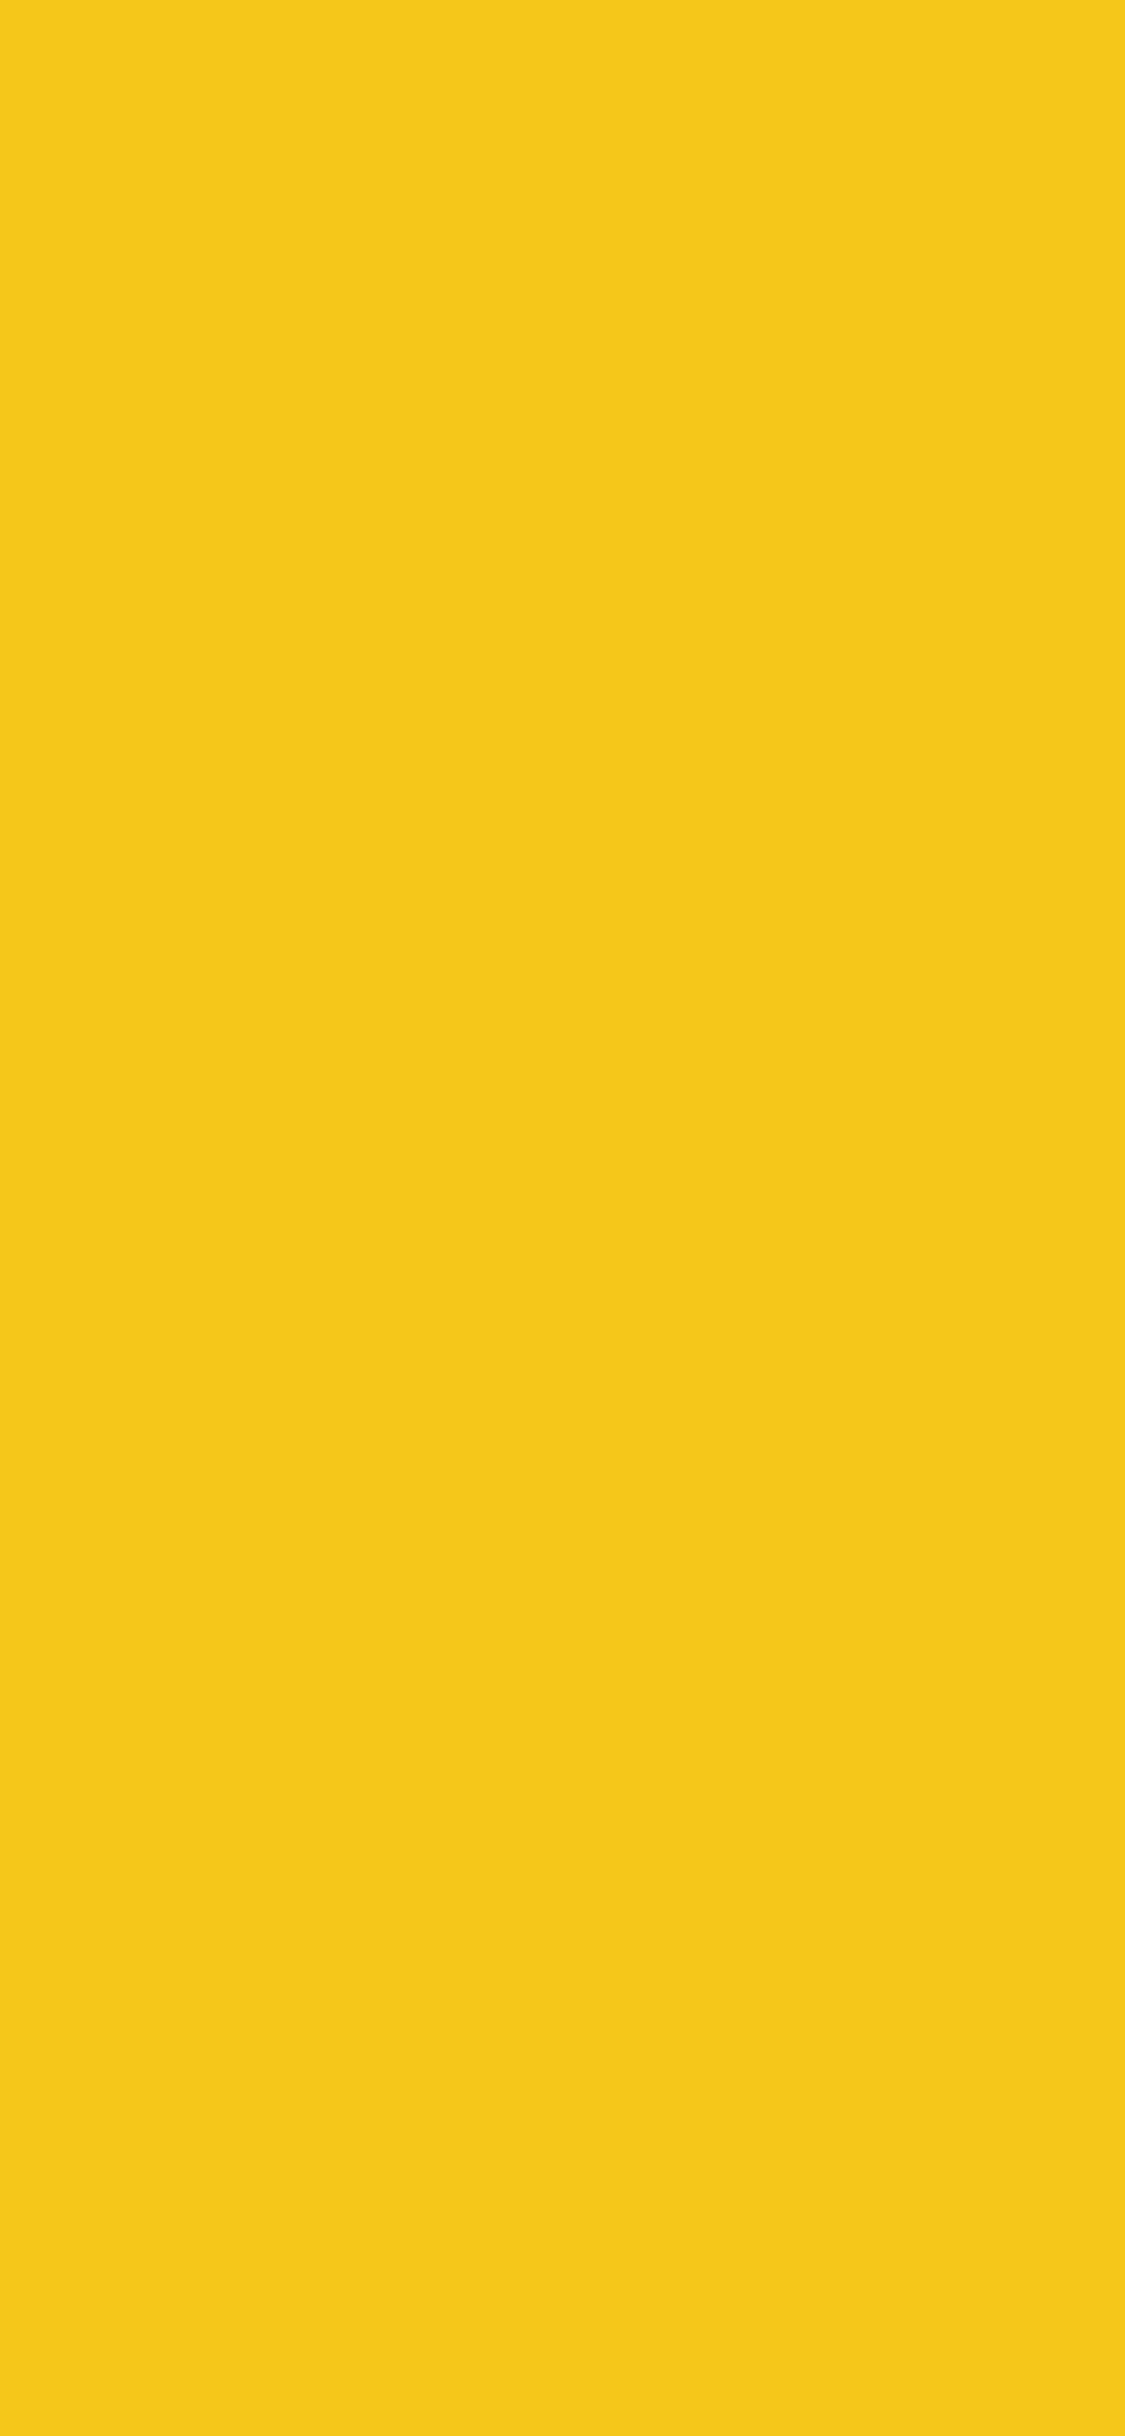 1125x2436 Deep Lemon Solid Color Background